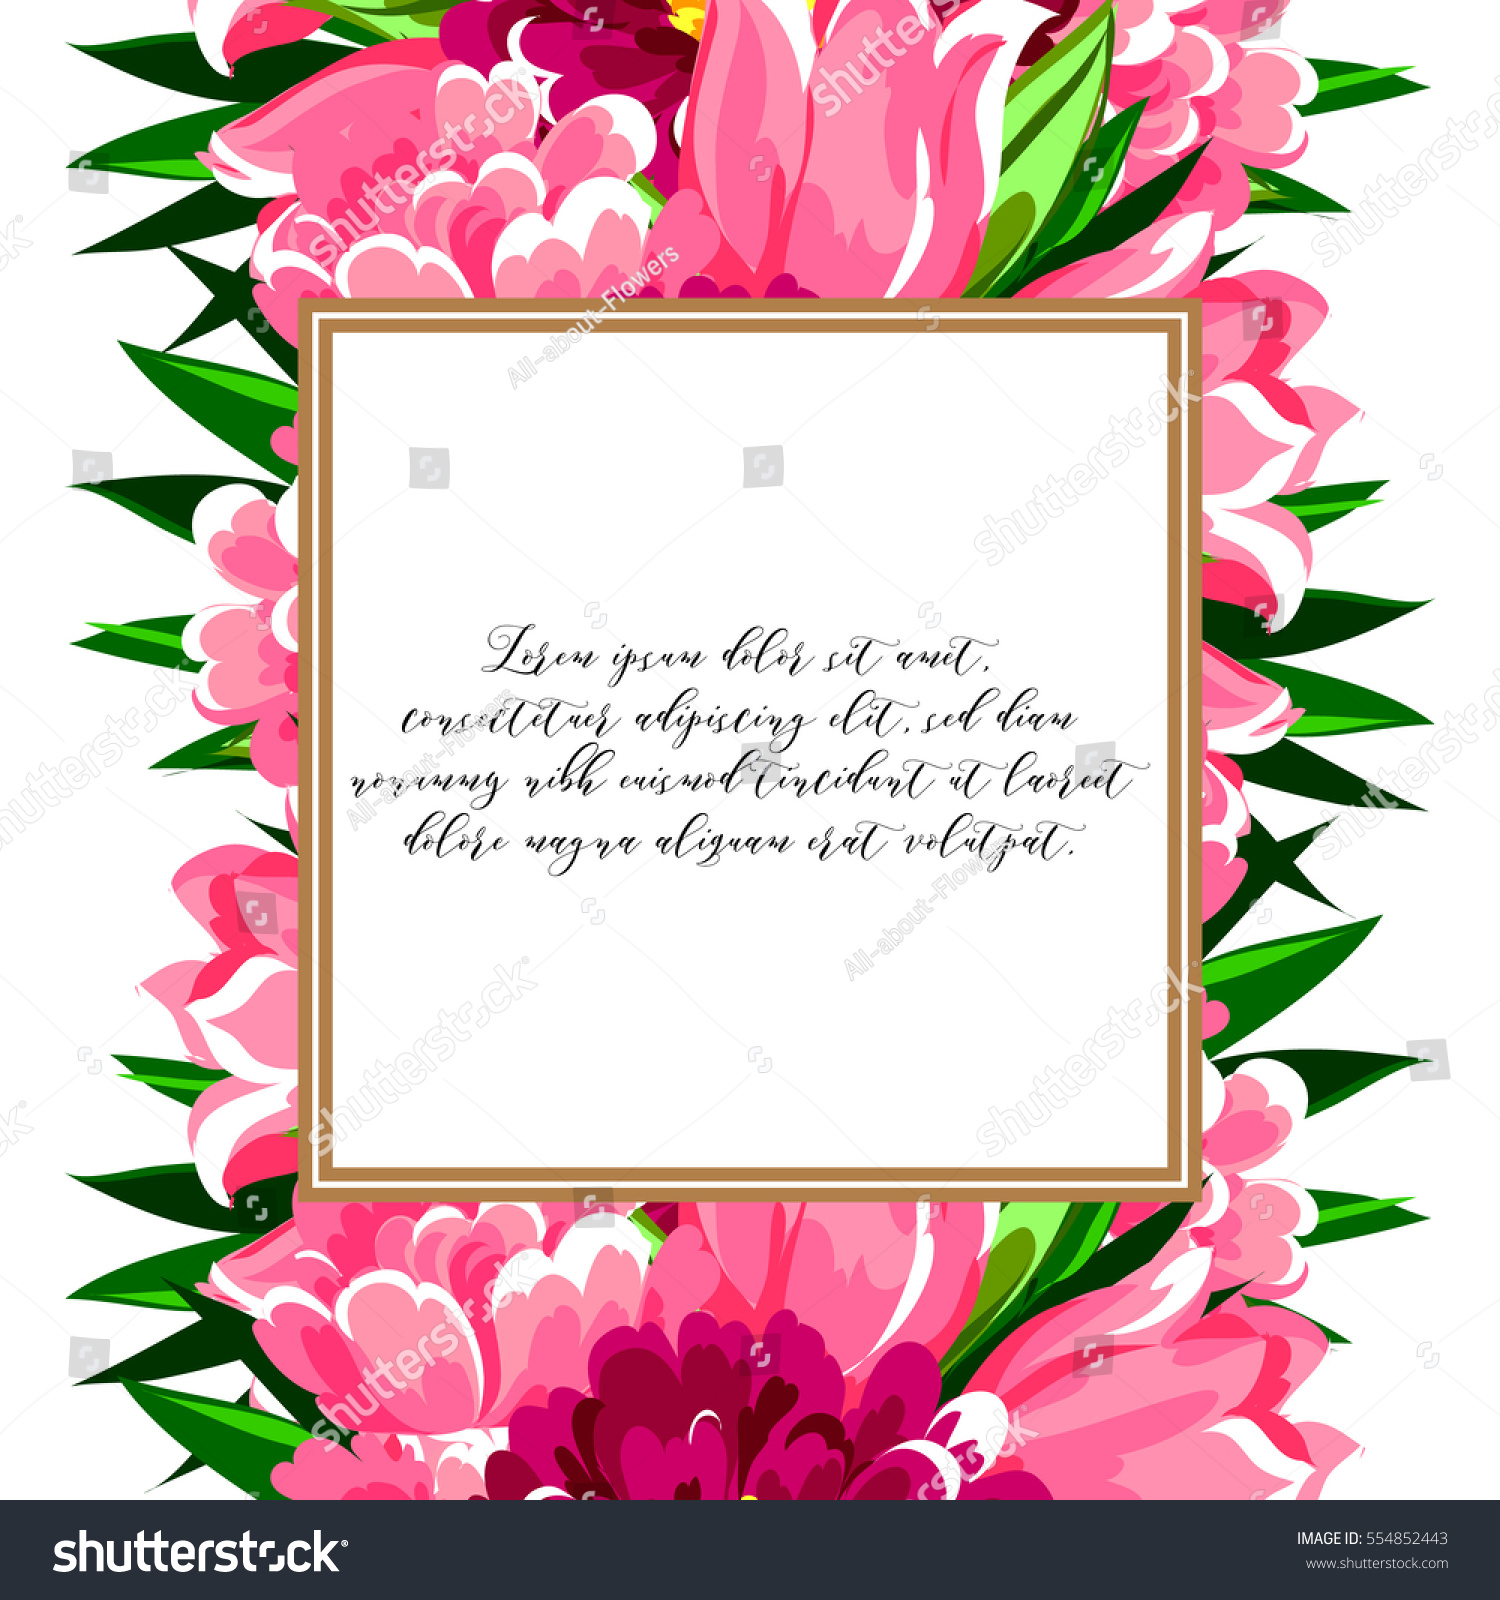 b43c95757 Vintage Delicate Invitation Flowers Wedding Marriage Stock ...